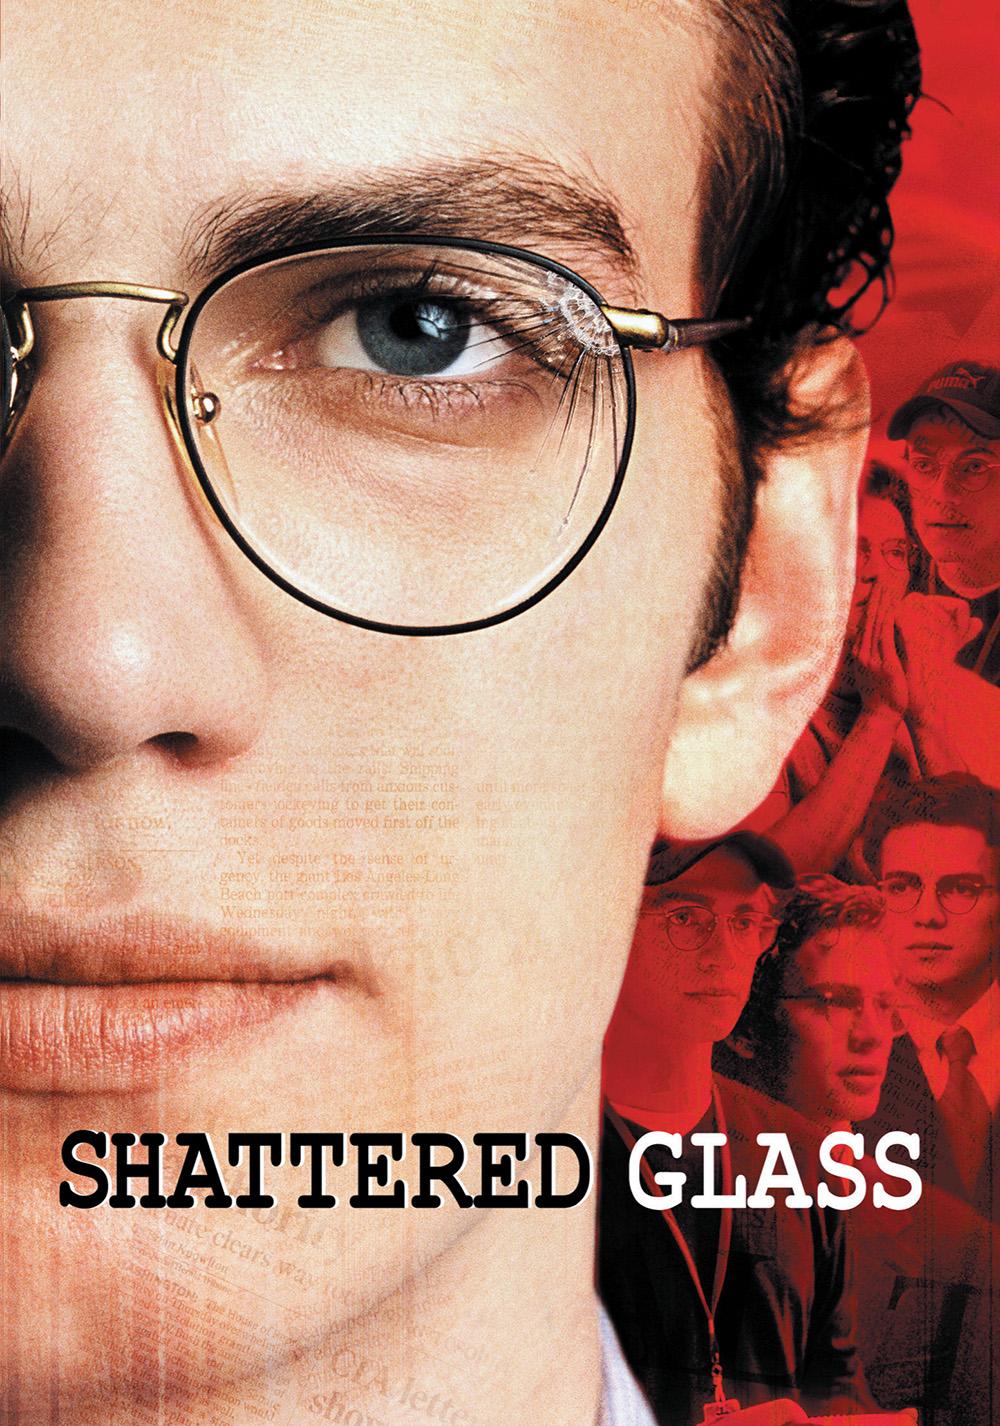 Shattered Glass...